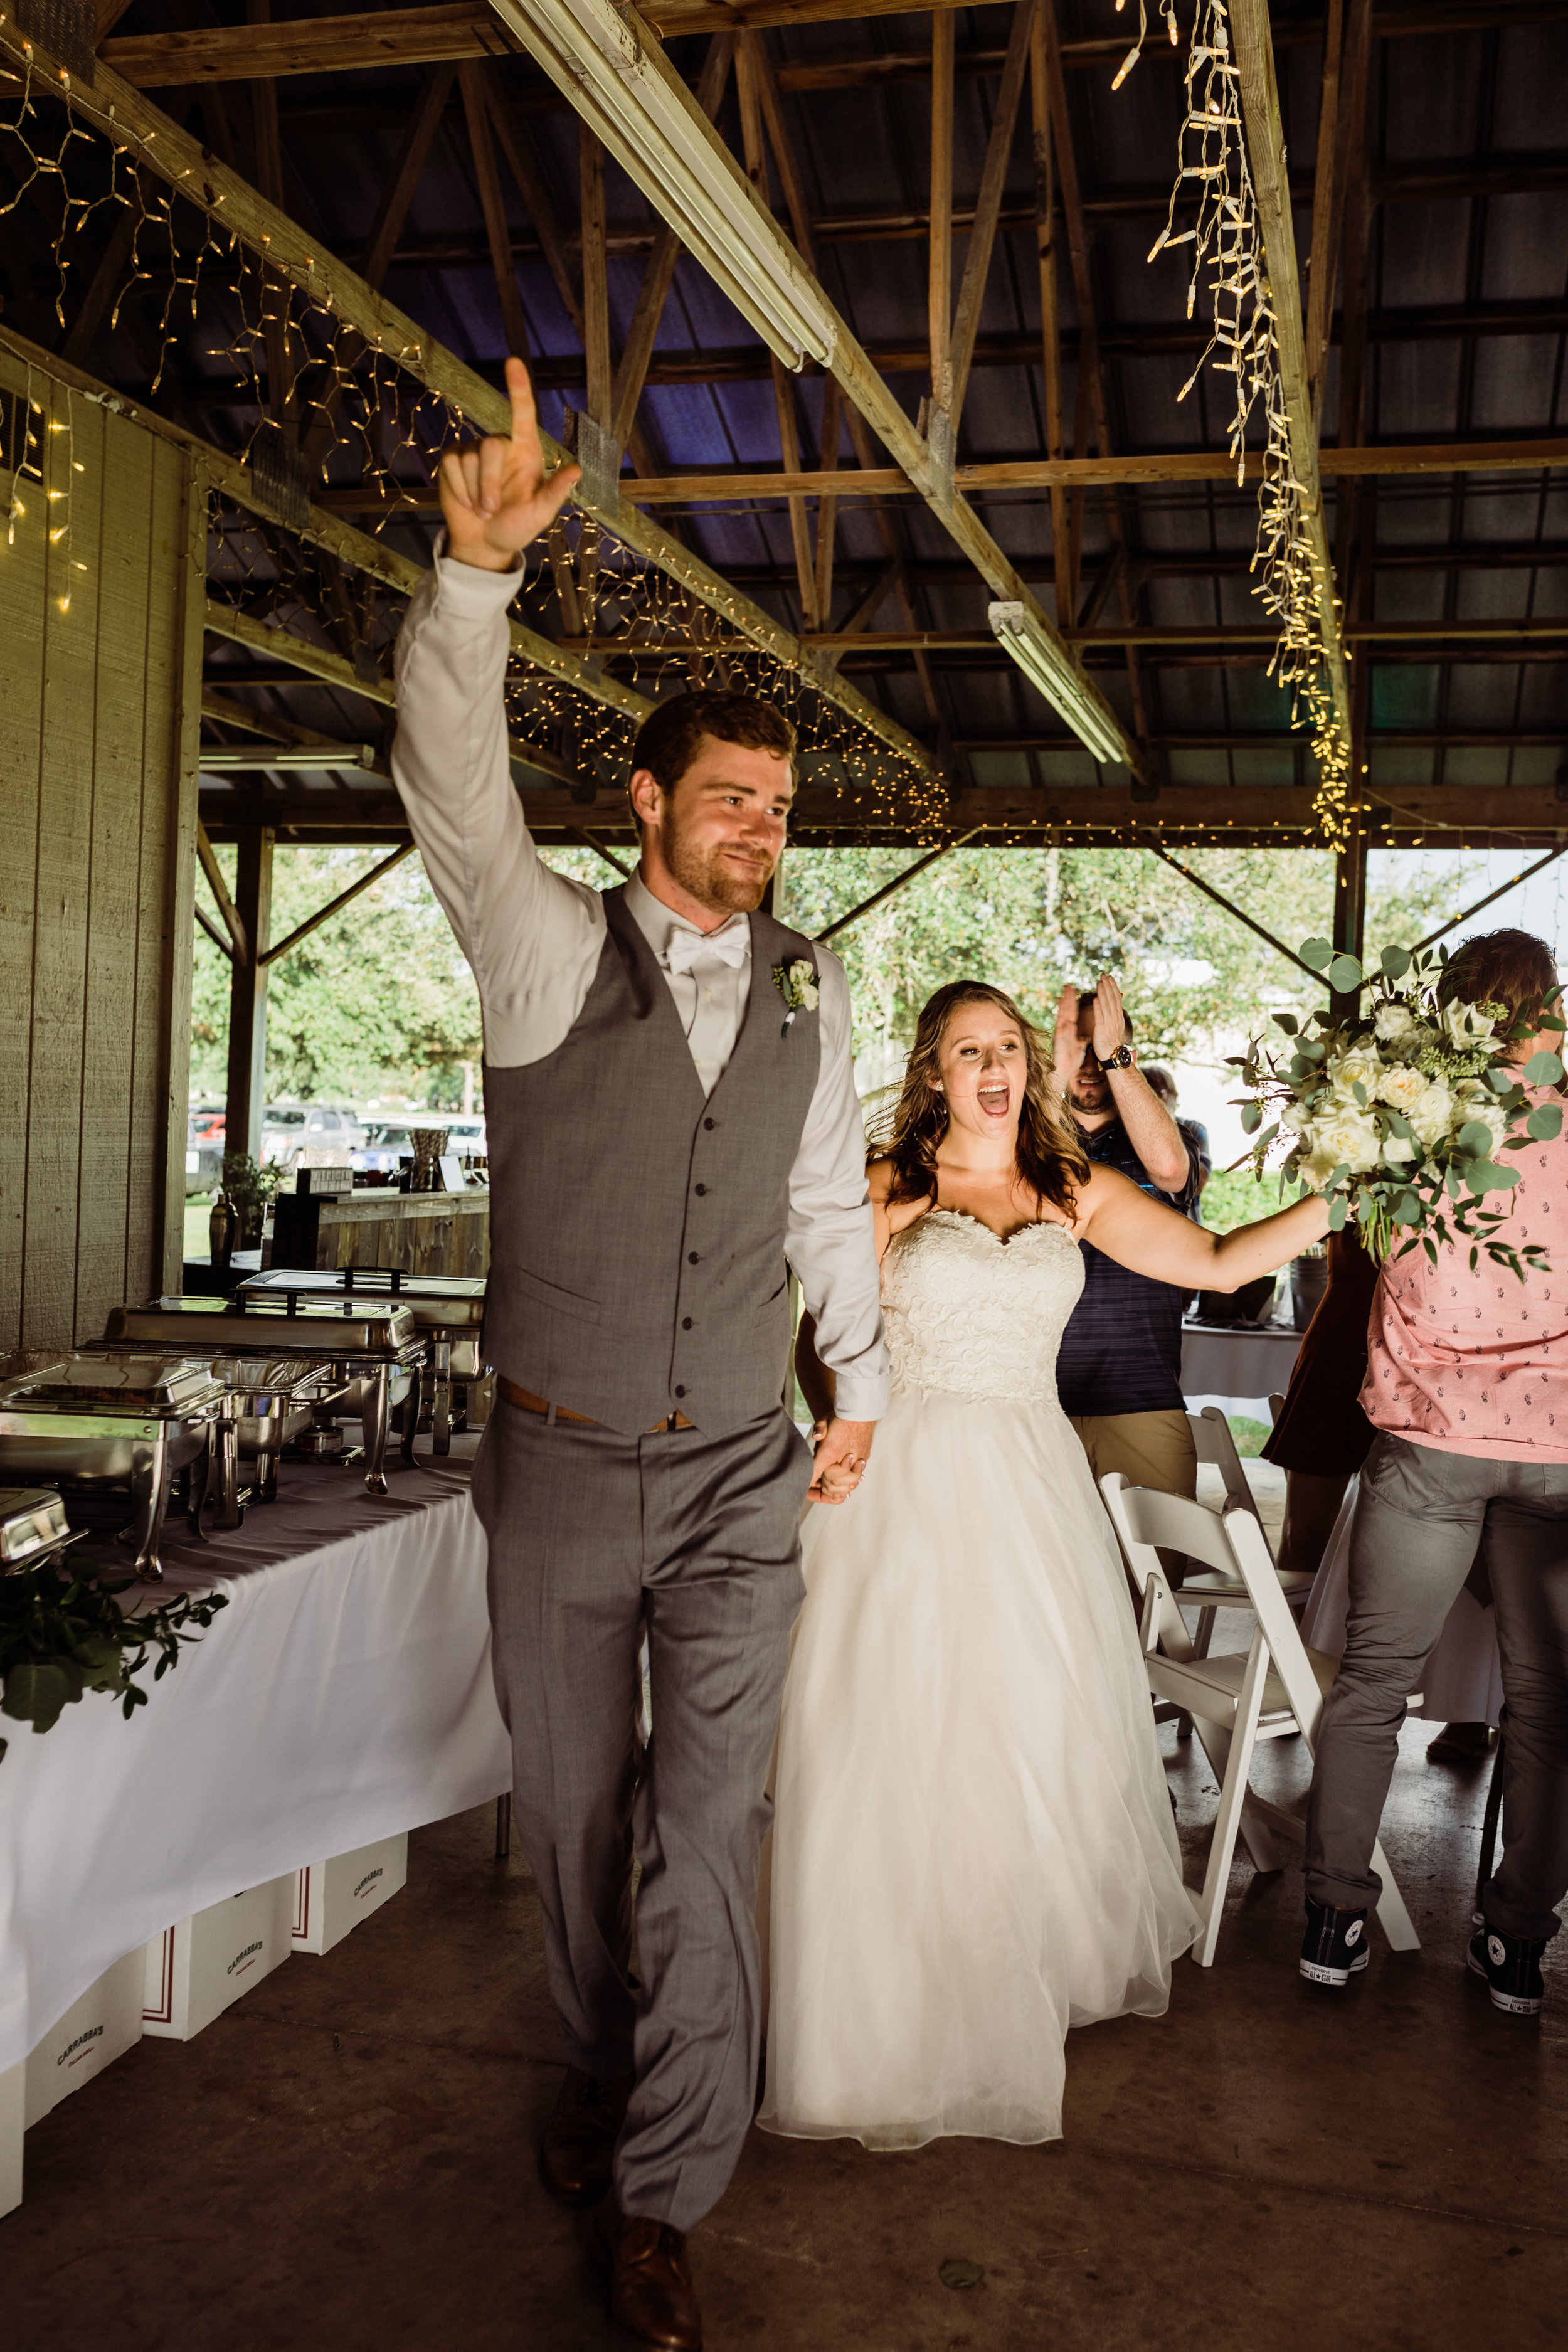 2017.10.14 Samantha and Matthew Crabtree Sarasota Wedding (431 of 708).jpg